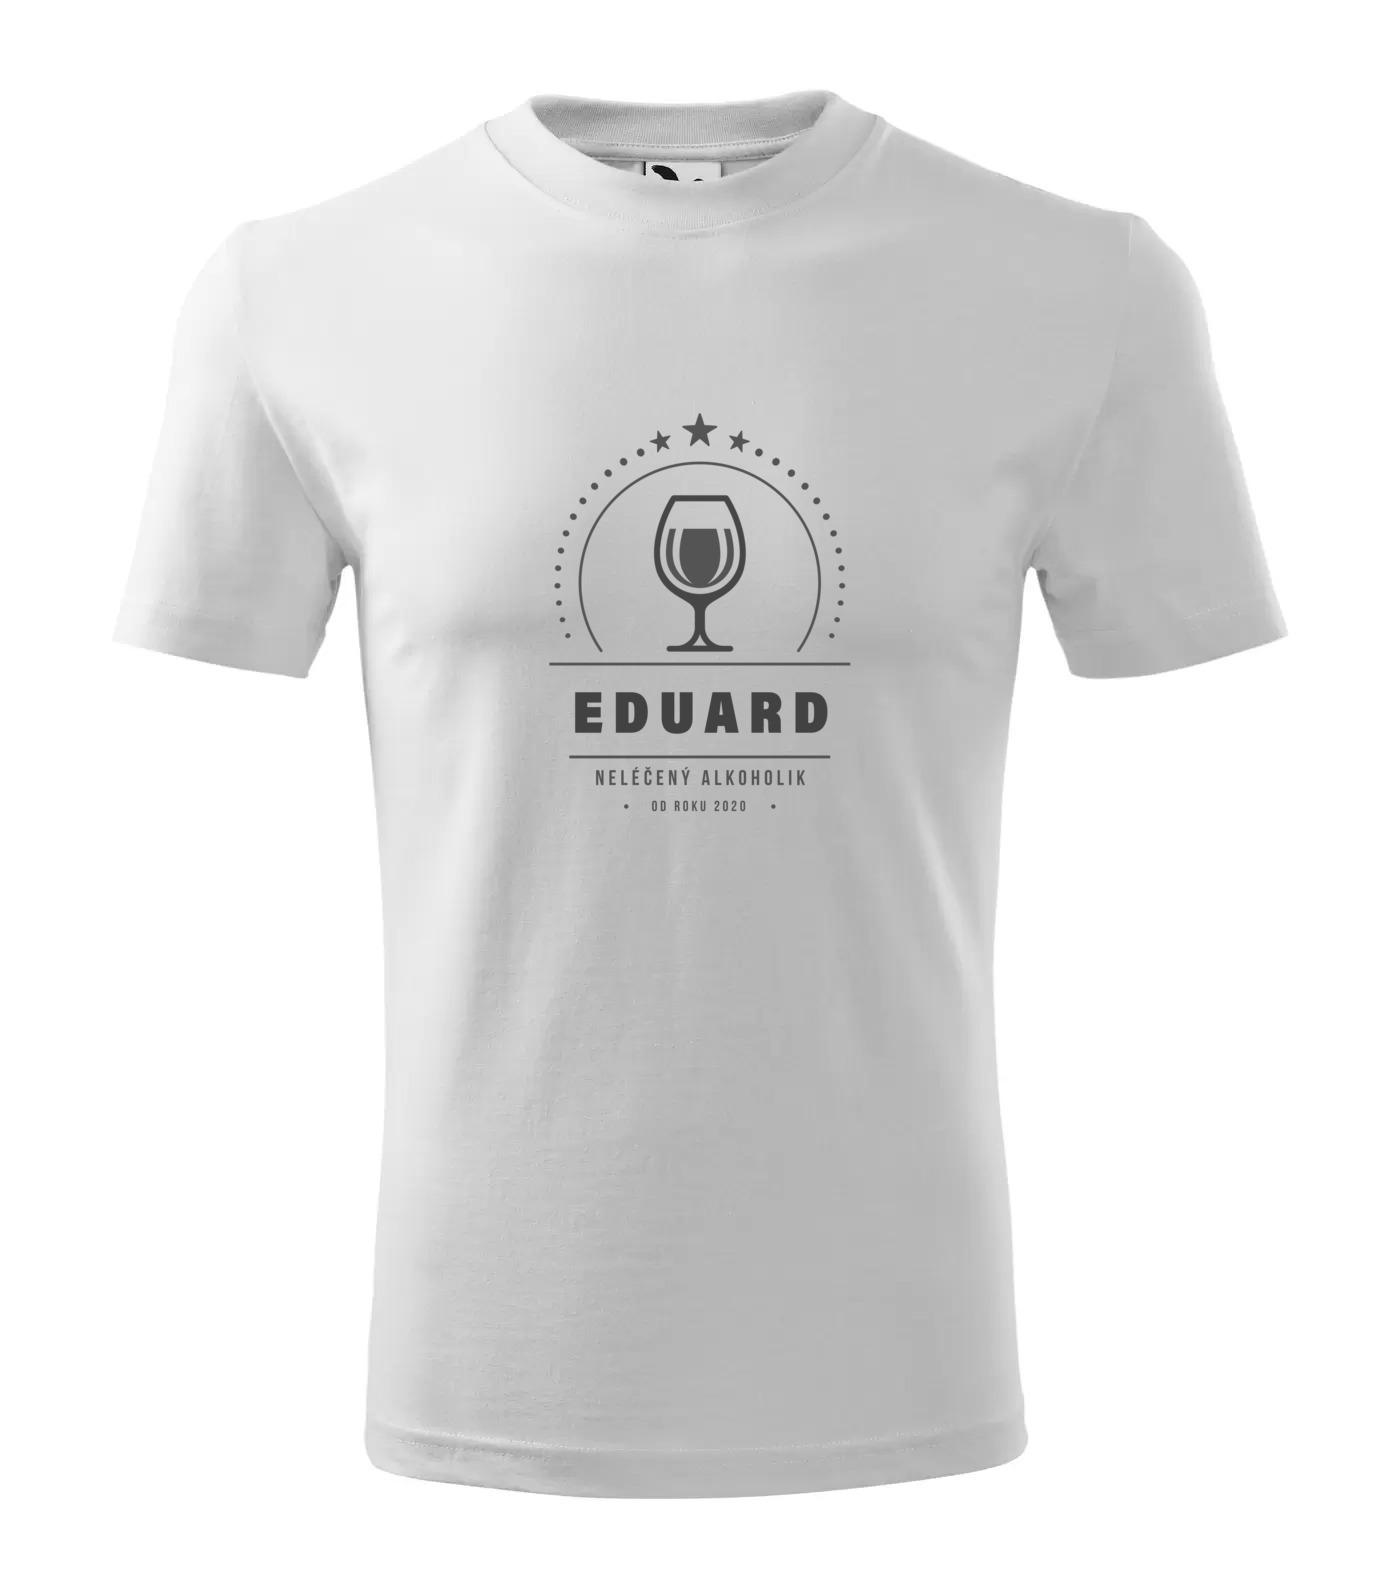 Tričko Alkoholik Eduard